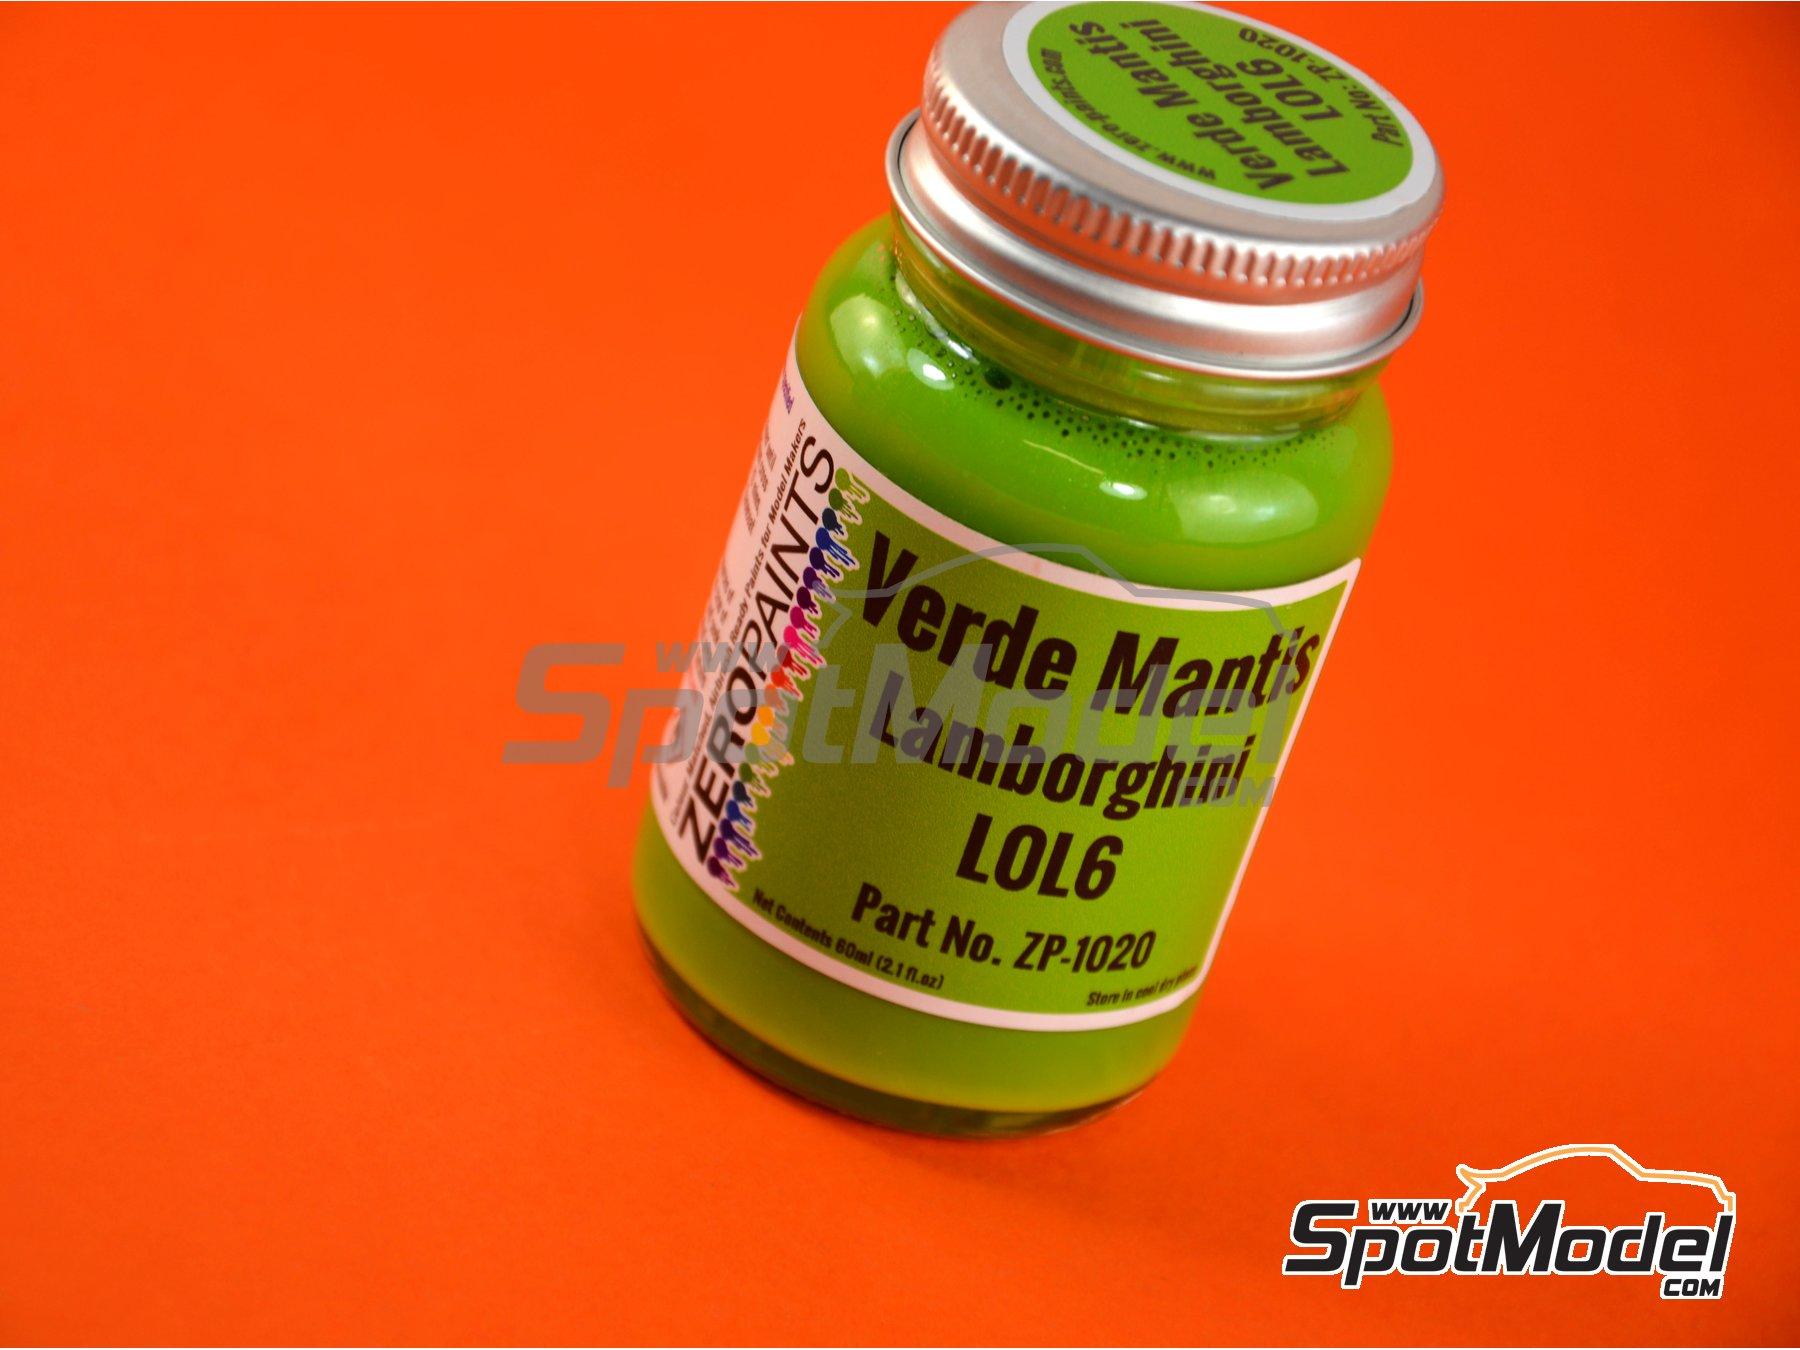 Image 1: Verde Mantis Lamborghini Huracan - Código: L0L6 - 1 x 60ml | Pintura fabricado por Zero Paints (ref.ZP-1020-L0L6)